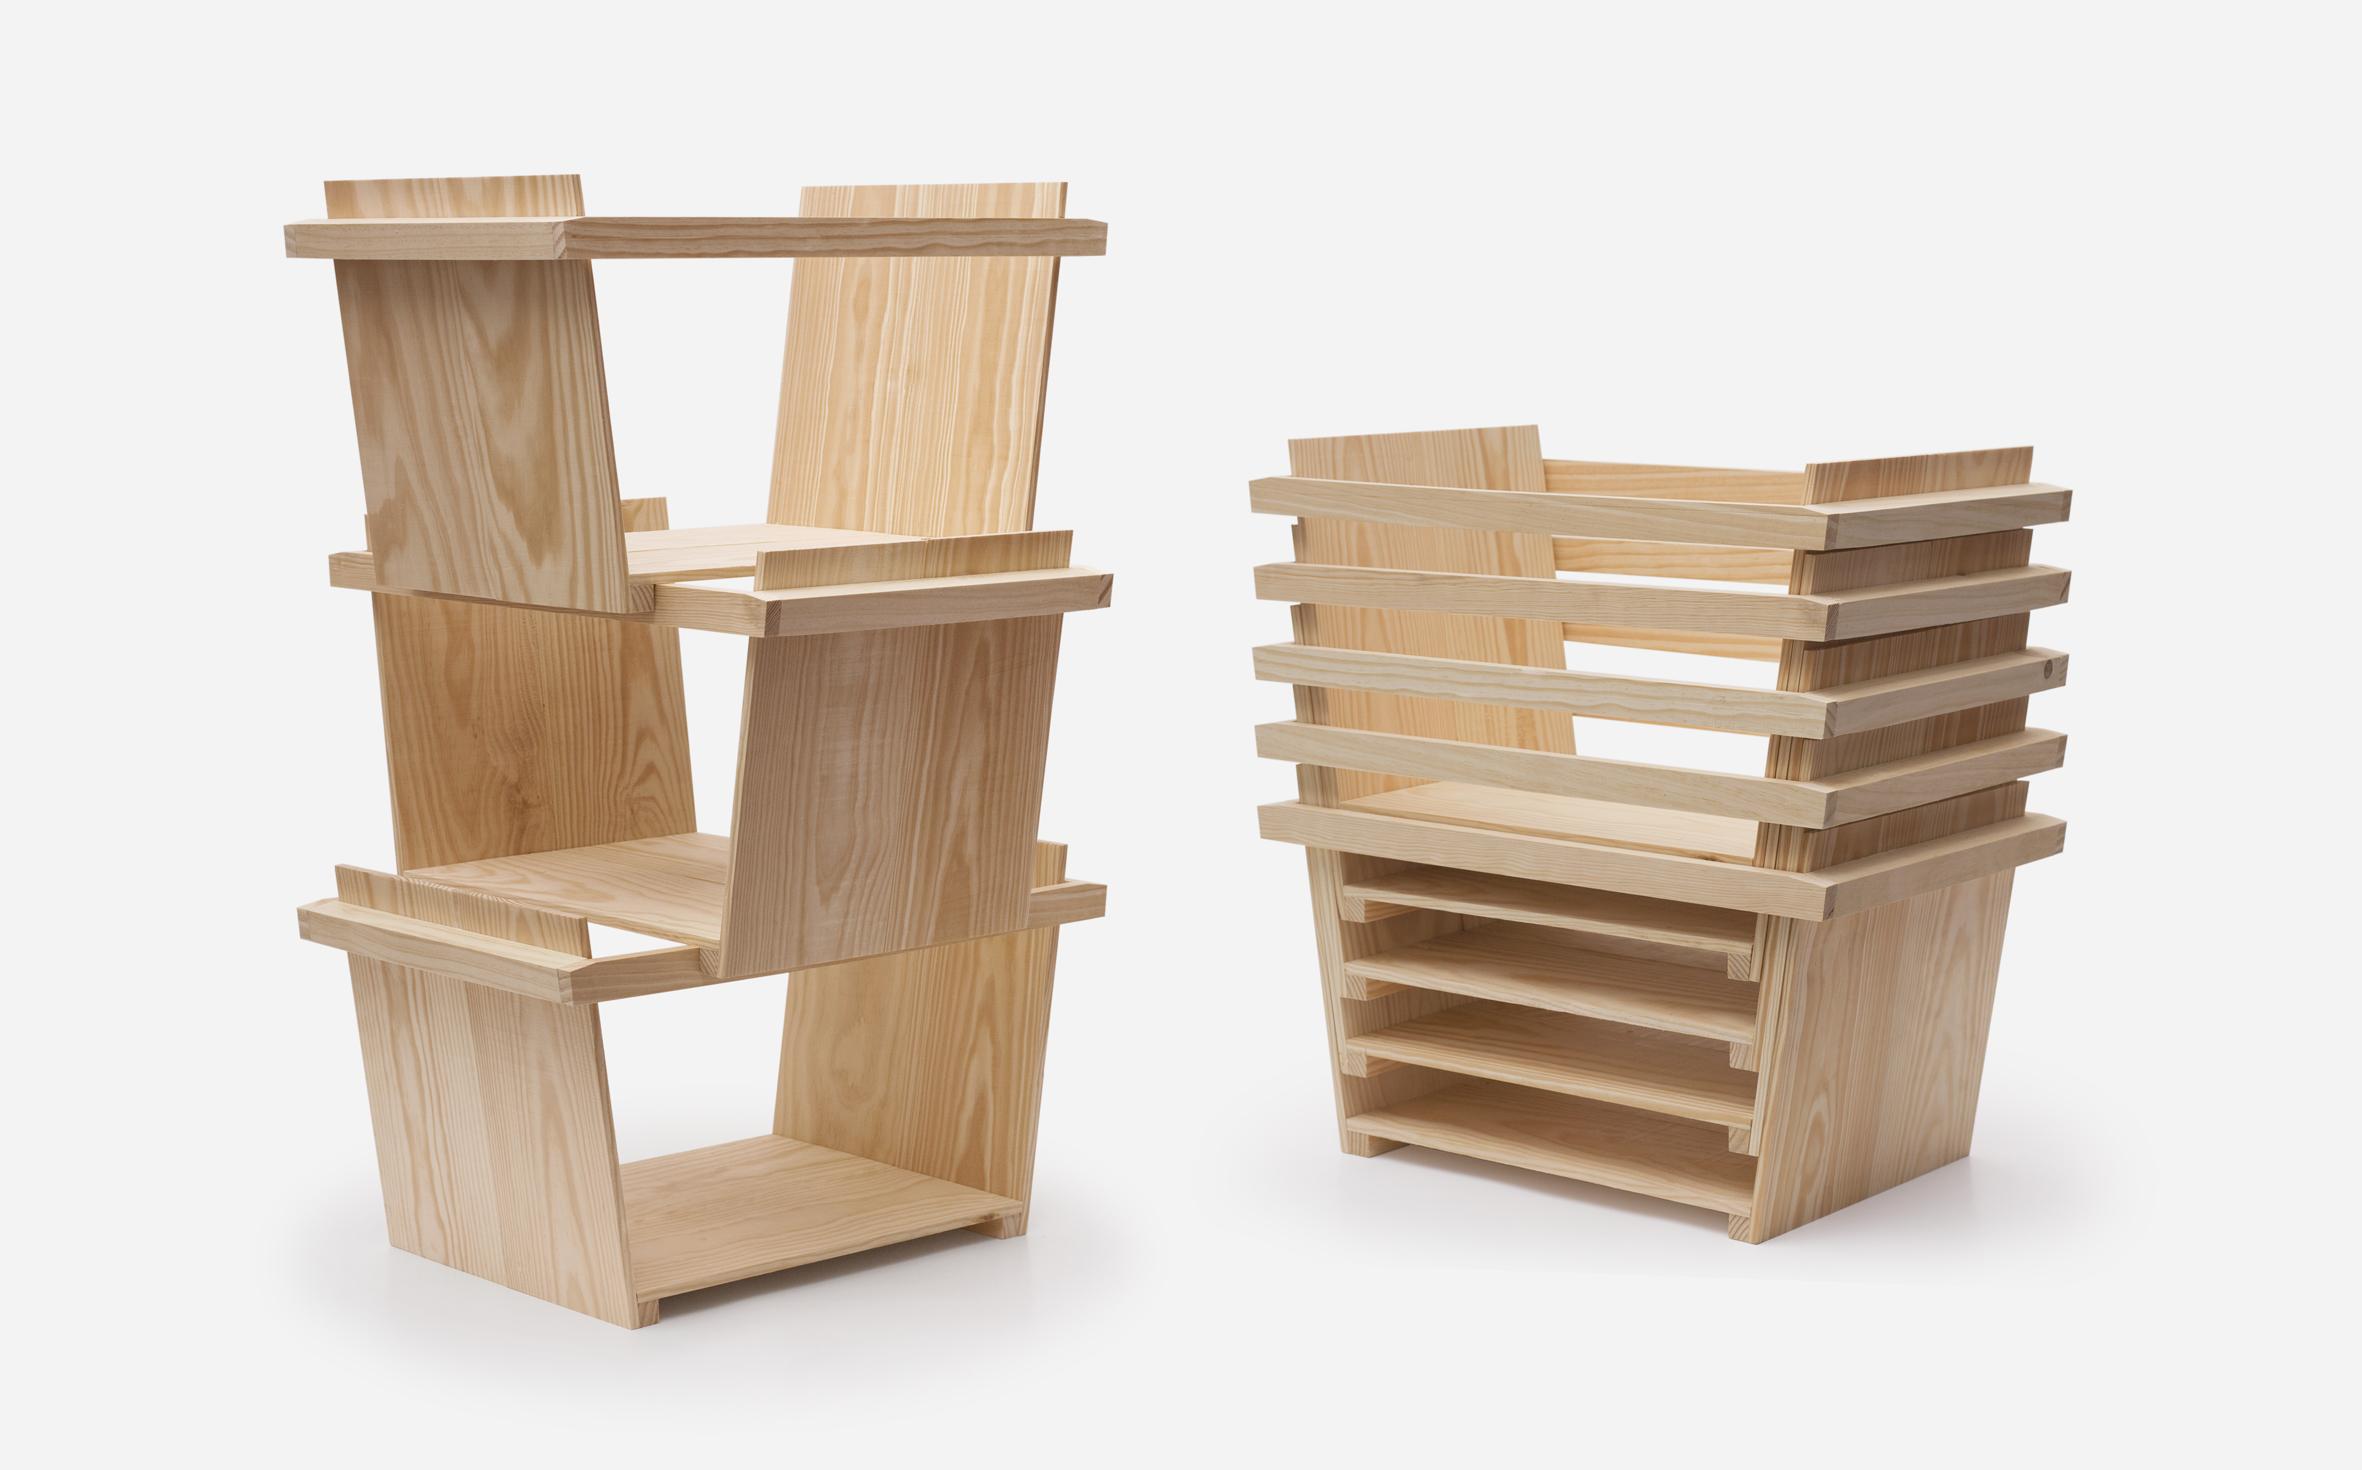 Amelia - Caja retornable para huerta by Cenlitrosmetrocadrado - Creative Work